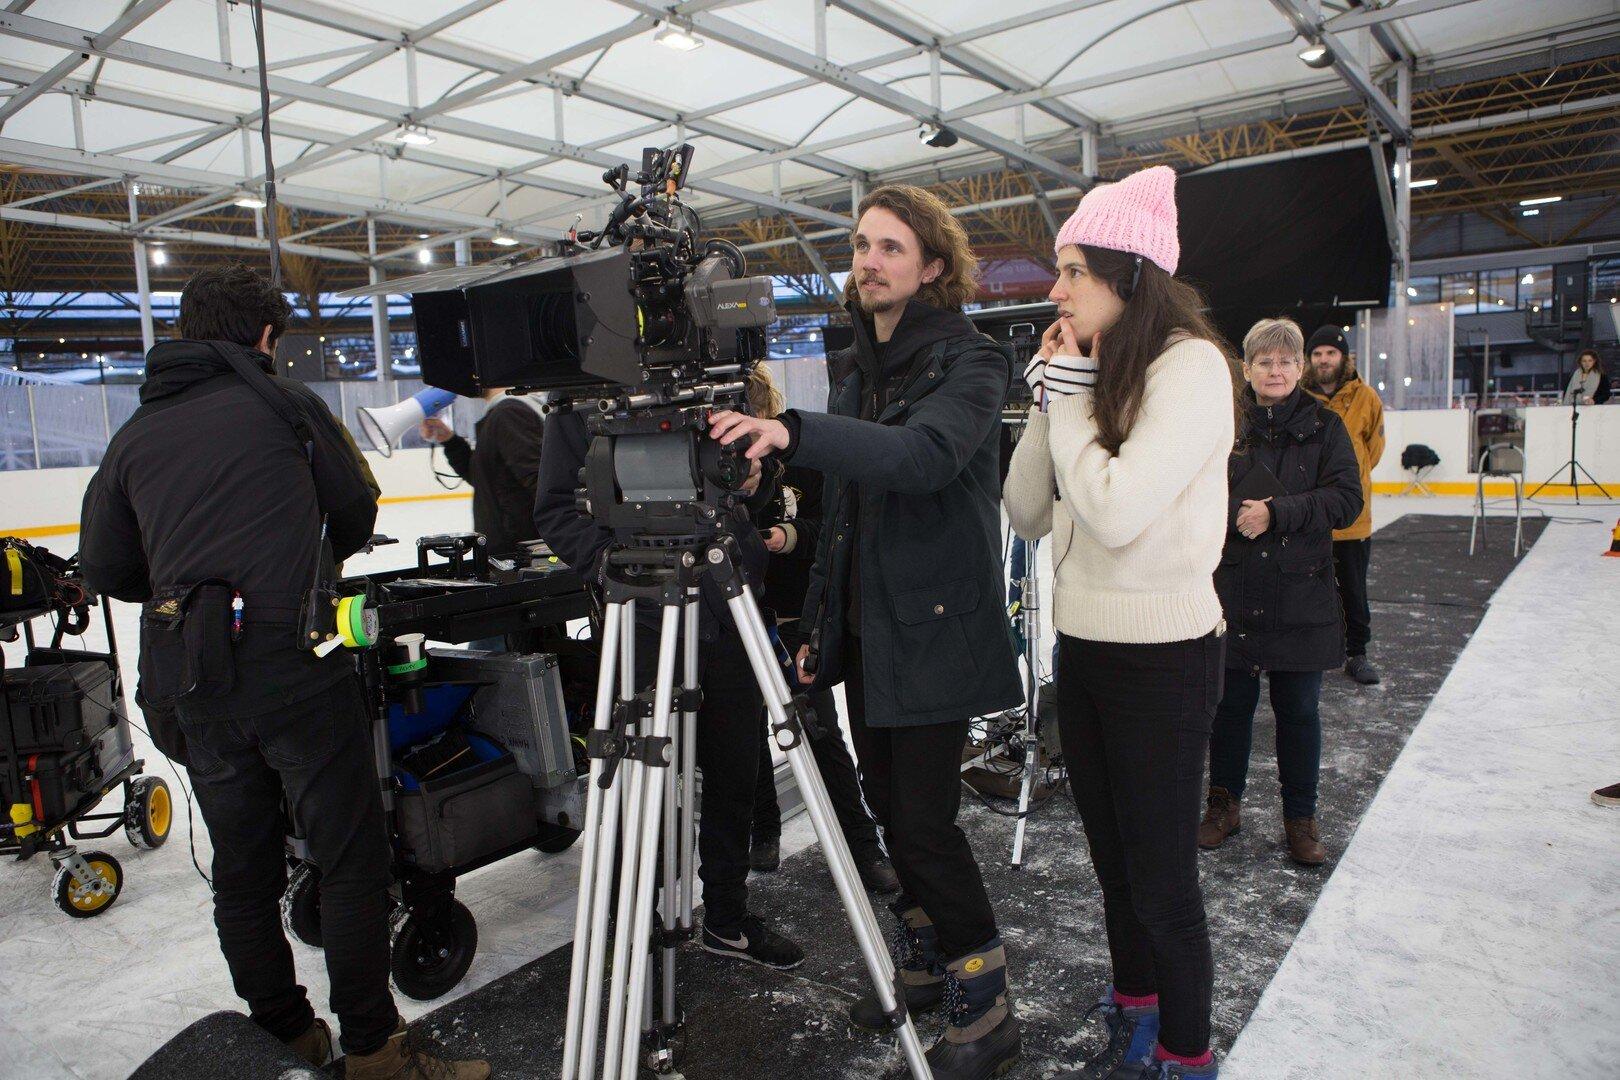 Behind the scenes of Thin Ice - Joosje Duk (director) and Roy van Egmond (cinematographer)